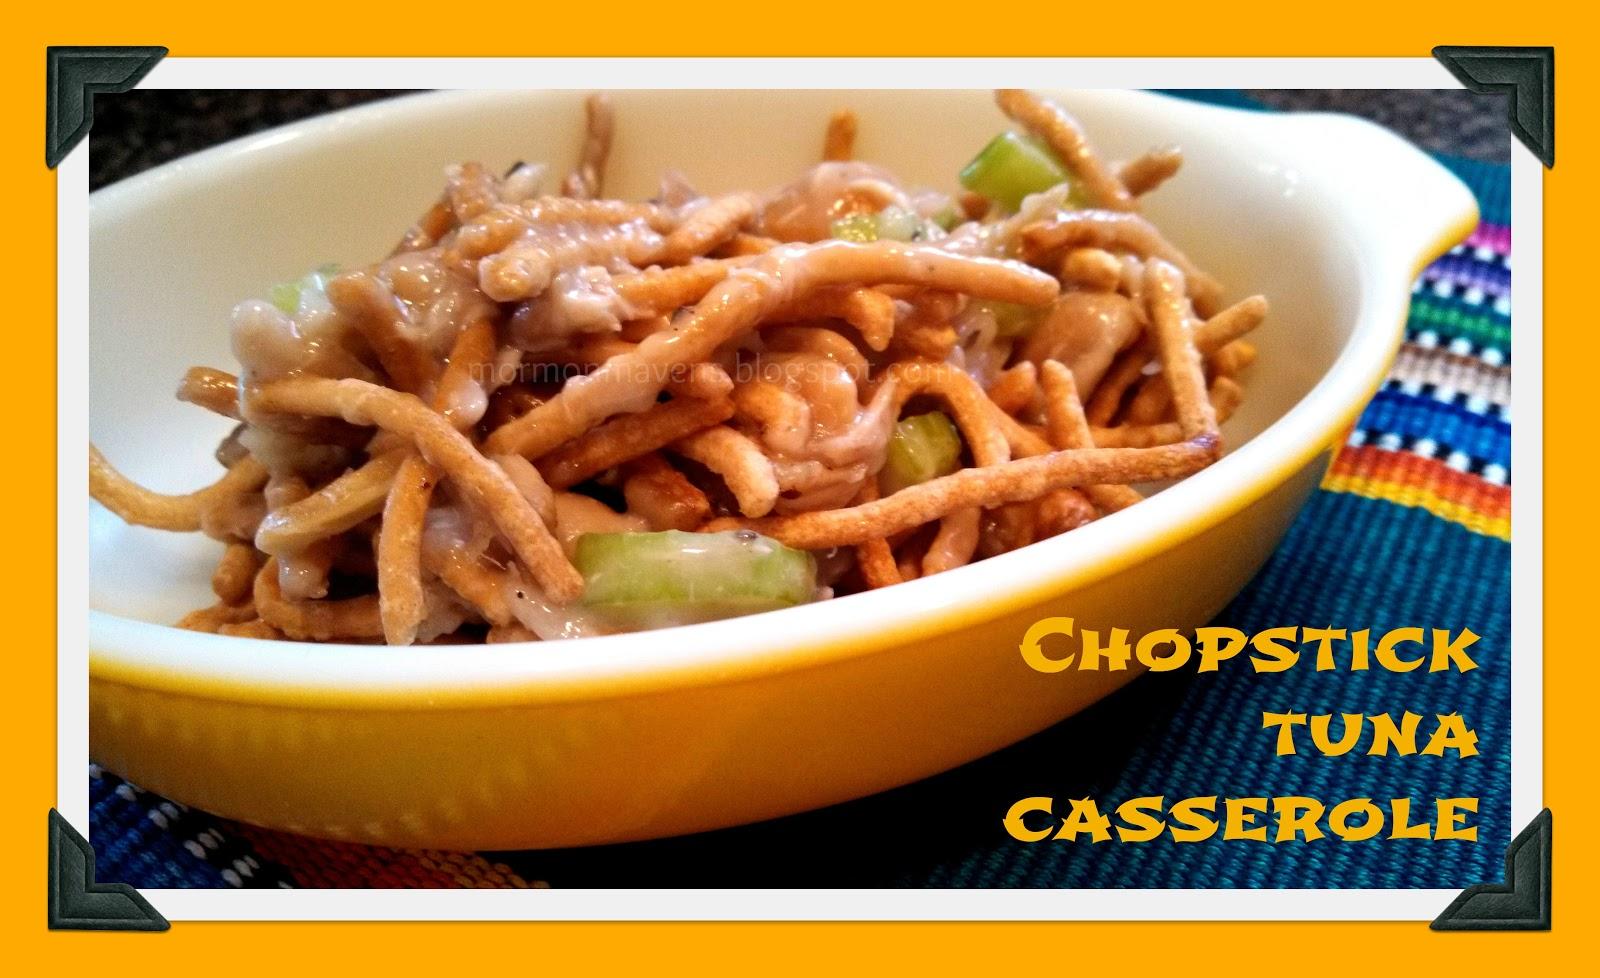 mormon mavens in the kitchen: chopstick tuna casserole